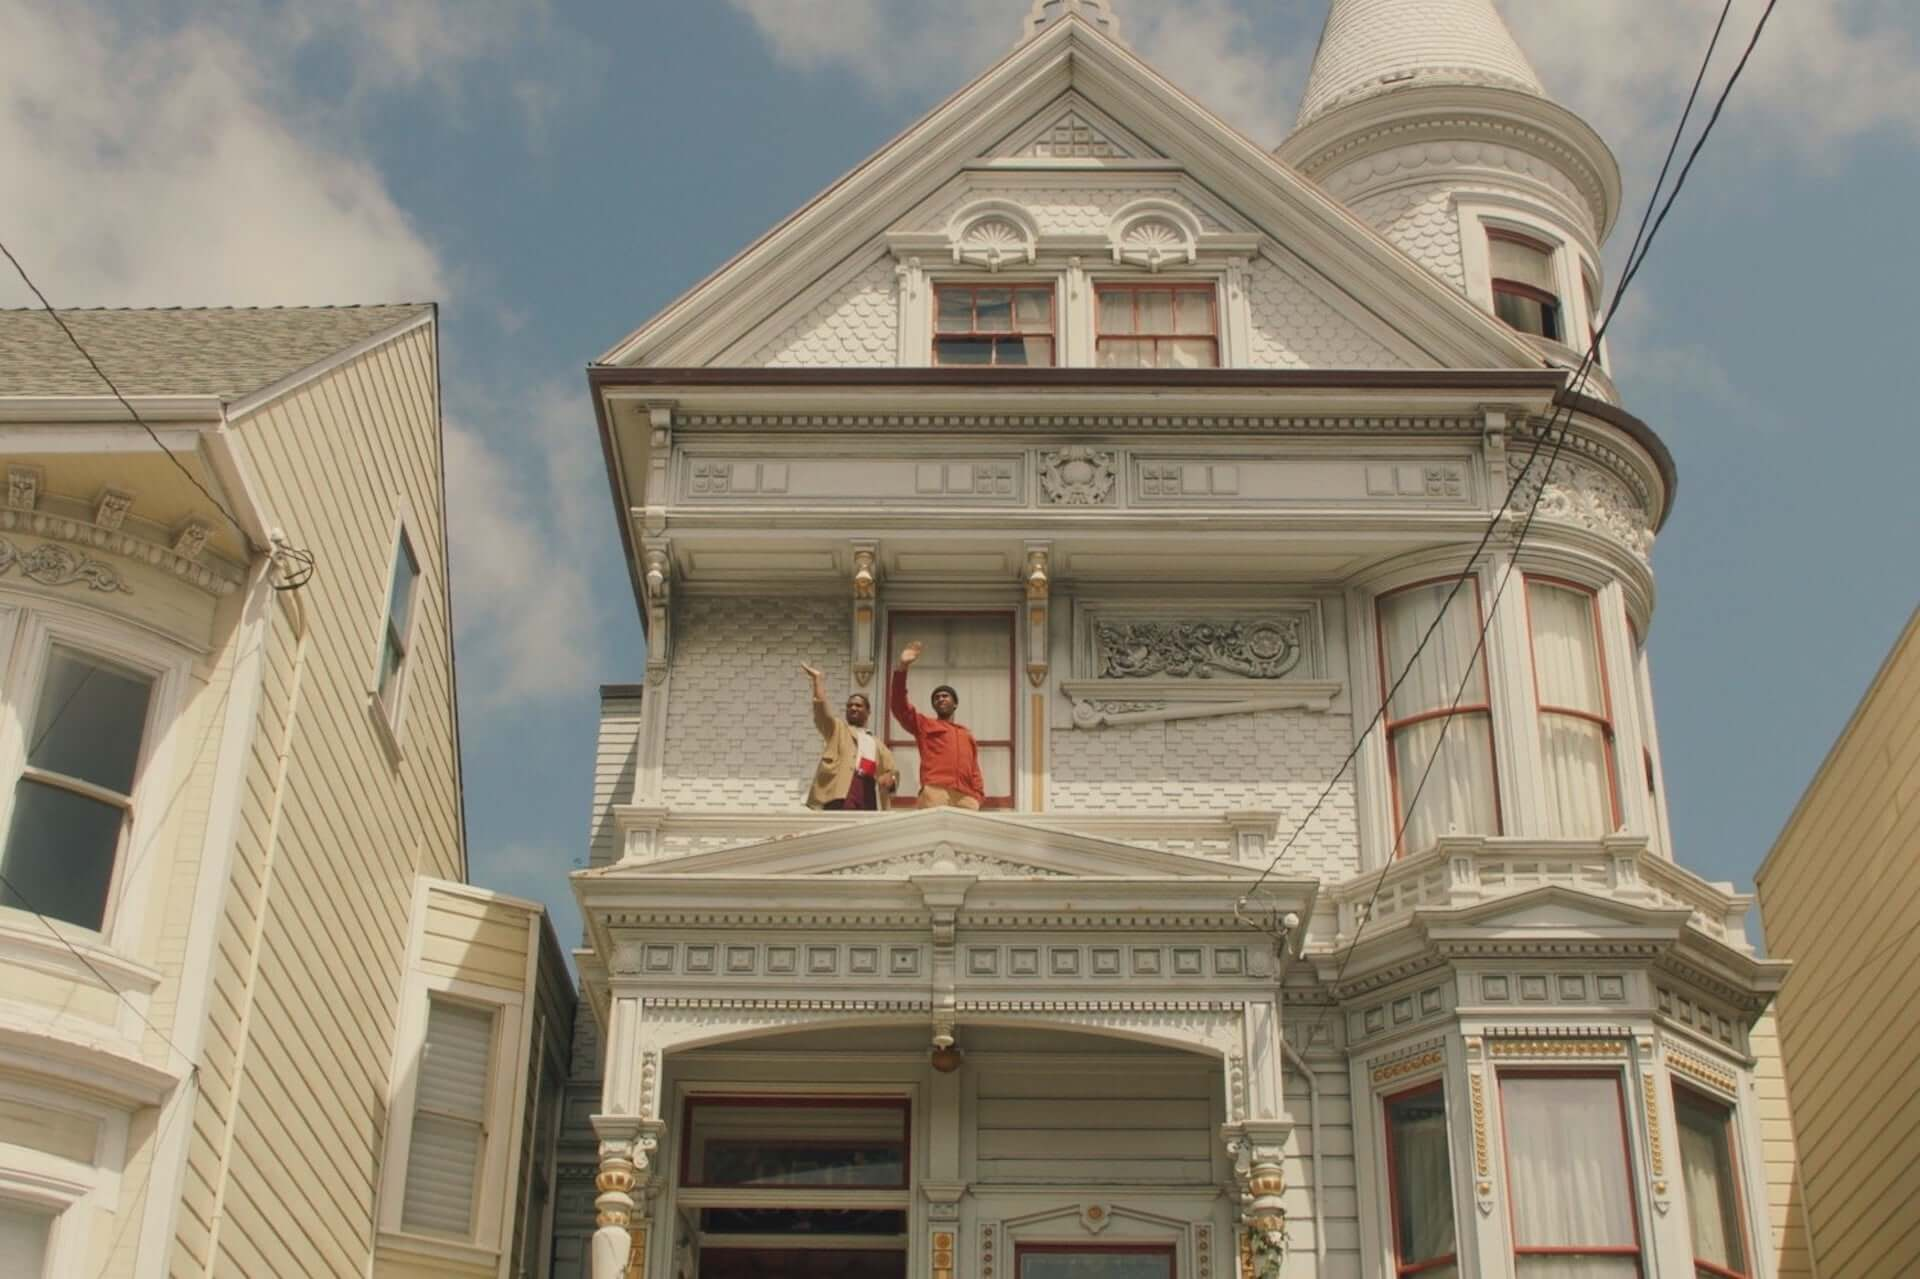 A24とプランBの再タッグとなる最新作『ラストブラックマン・イン・サンフランシスコ』新場面写真が解禁!ジョー・タルボット監督のコメントも到着 film200808_lastblackman_4-1920x1279